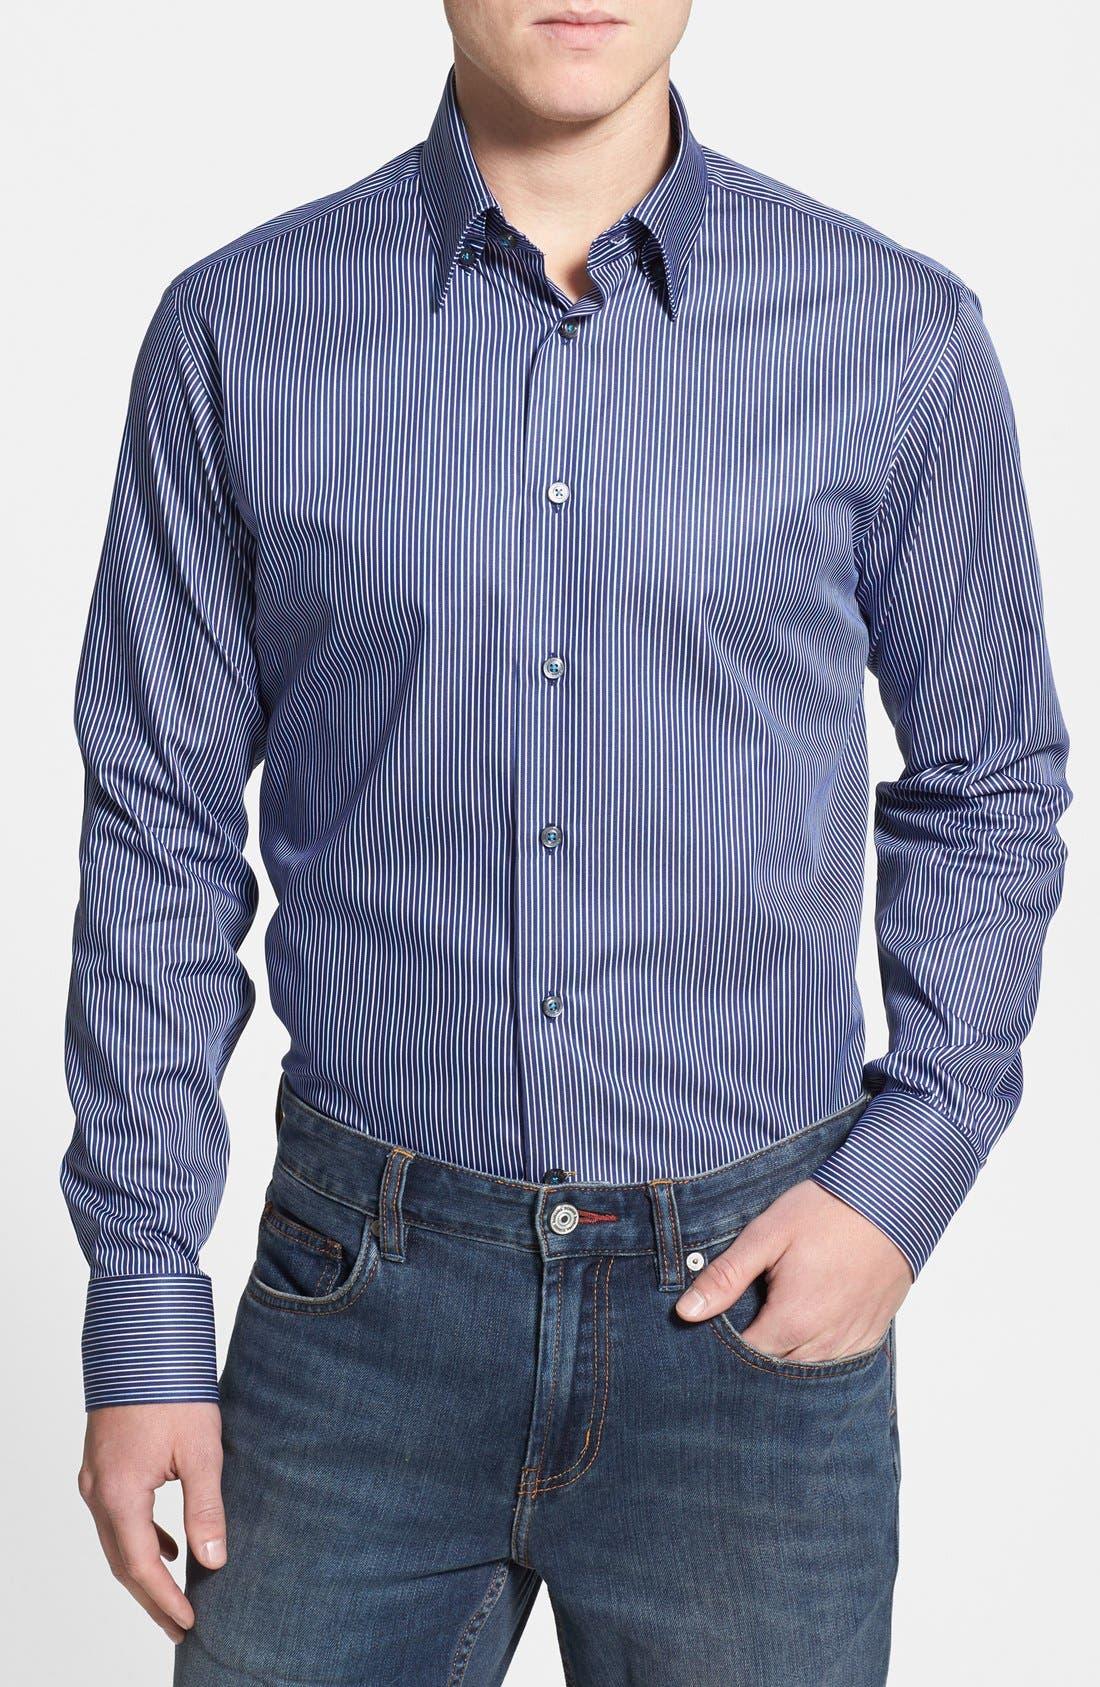 Alternate Image 1 Selected - Robert Talbott Trim Fit Stripe Woven Sport Shirt